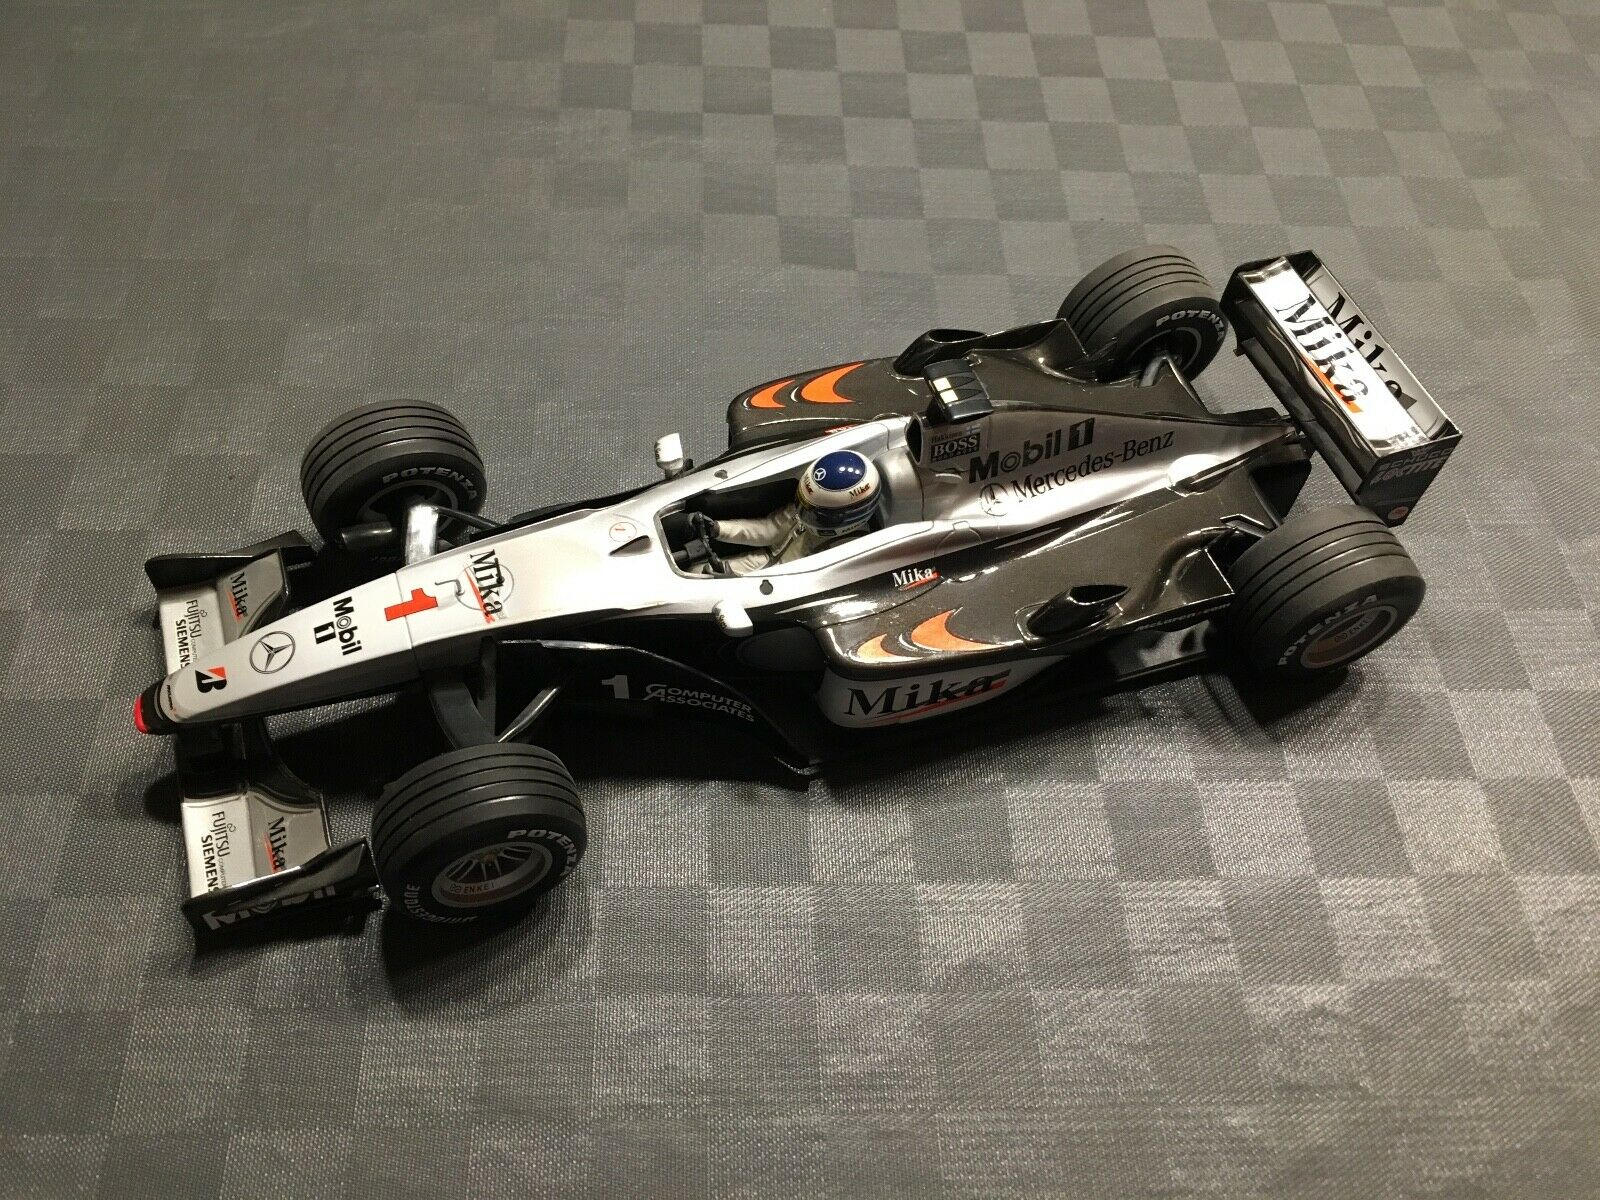 F1 McLaren-Mercedes MP 4 15, M. Hakkinen, 1 18, Pauls Model Art